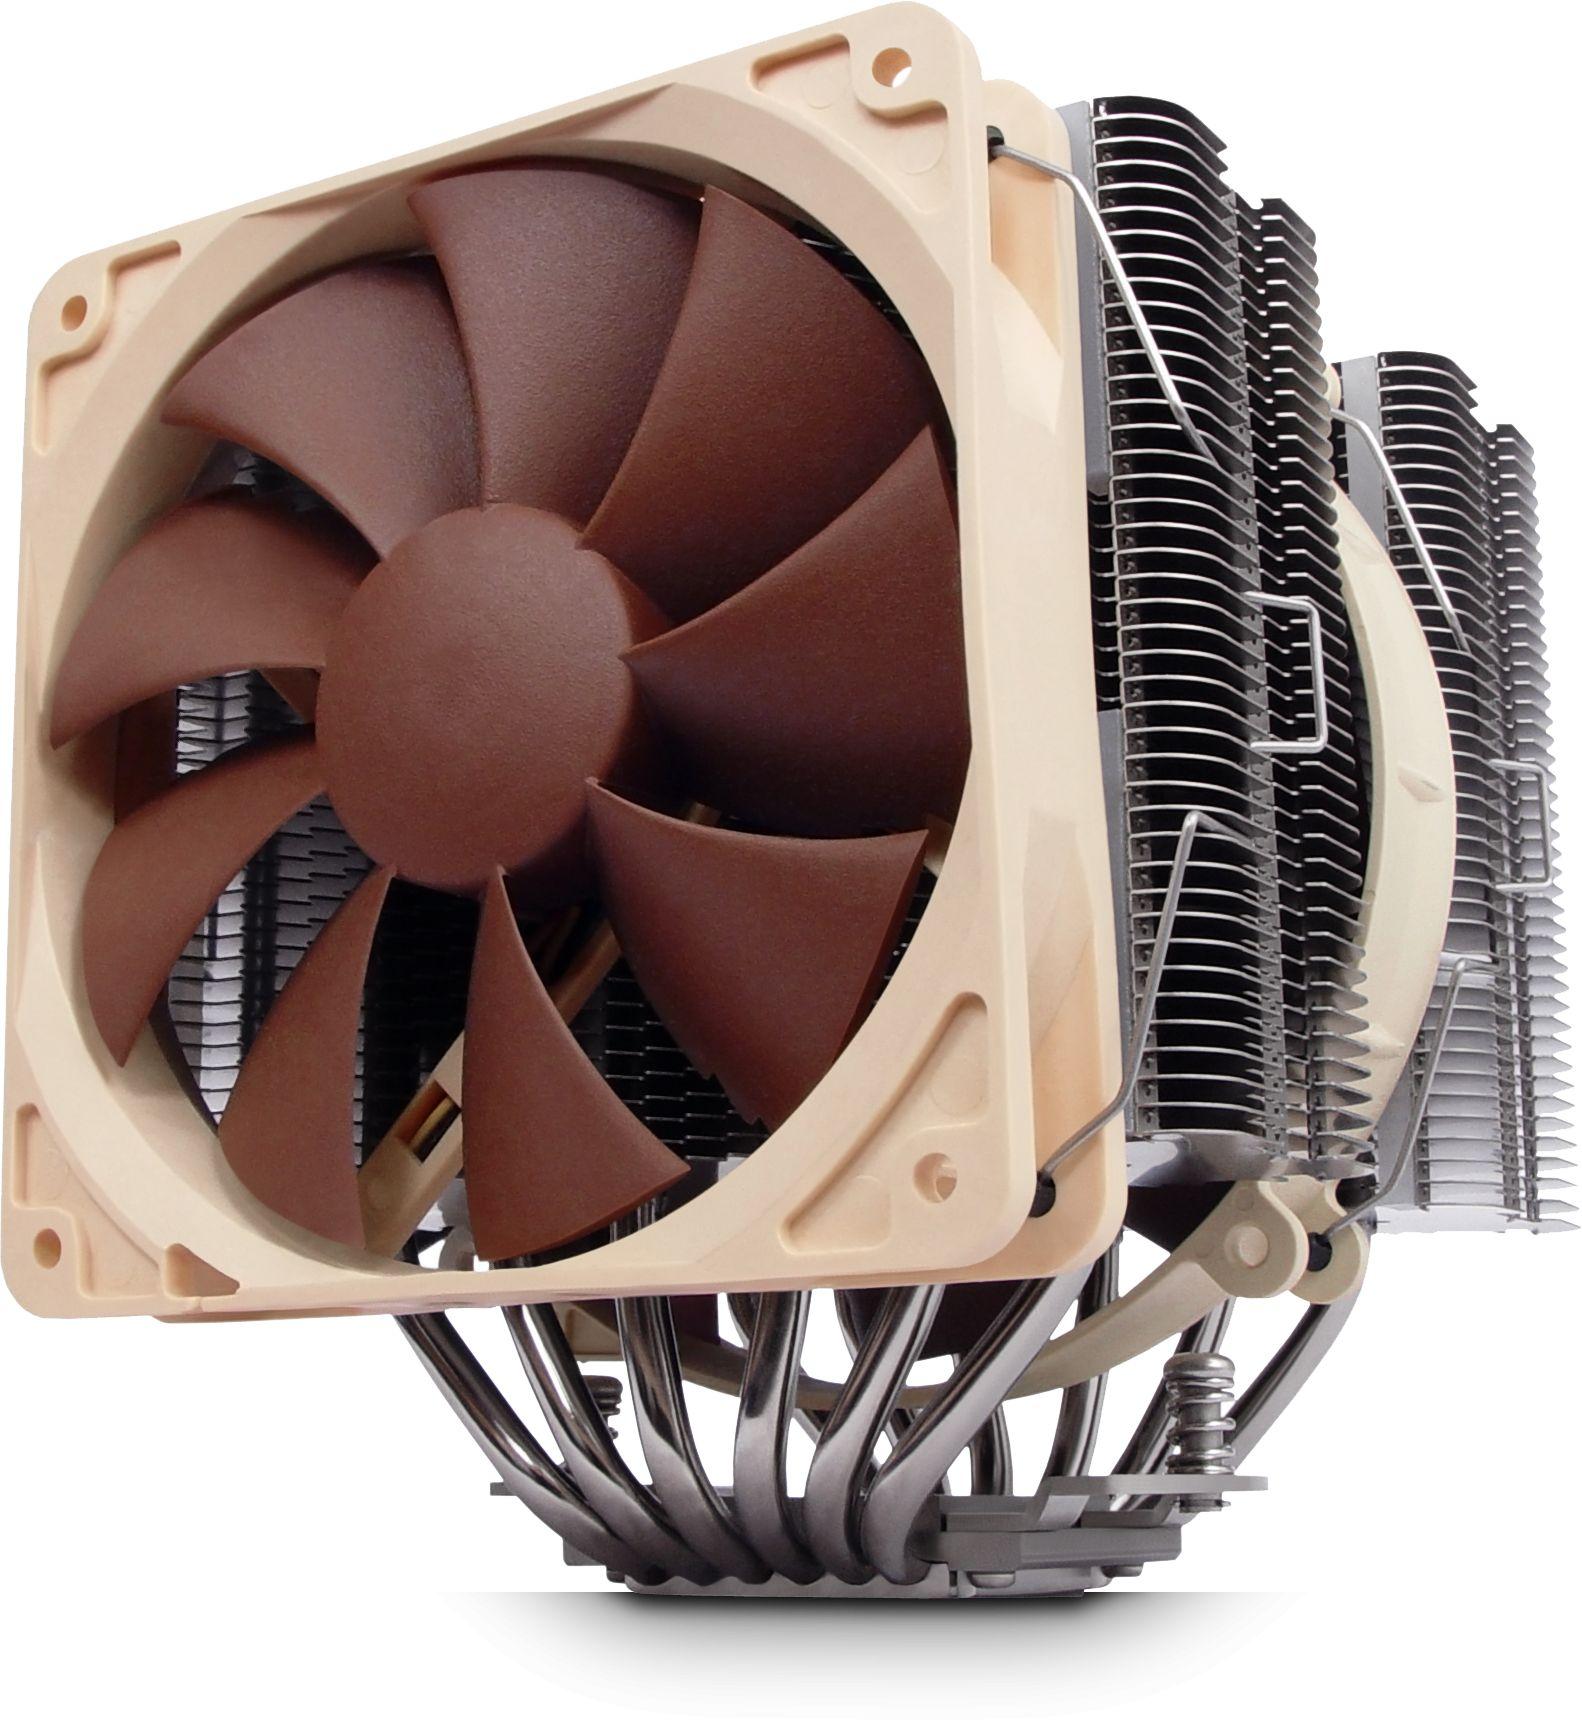 Nh D14 Dual Radiator And Fan Quiet Cpu Cooler